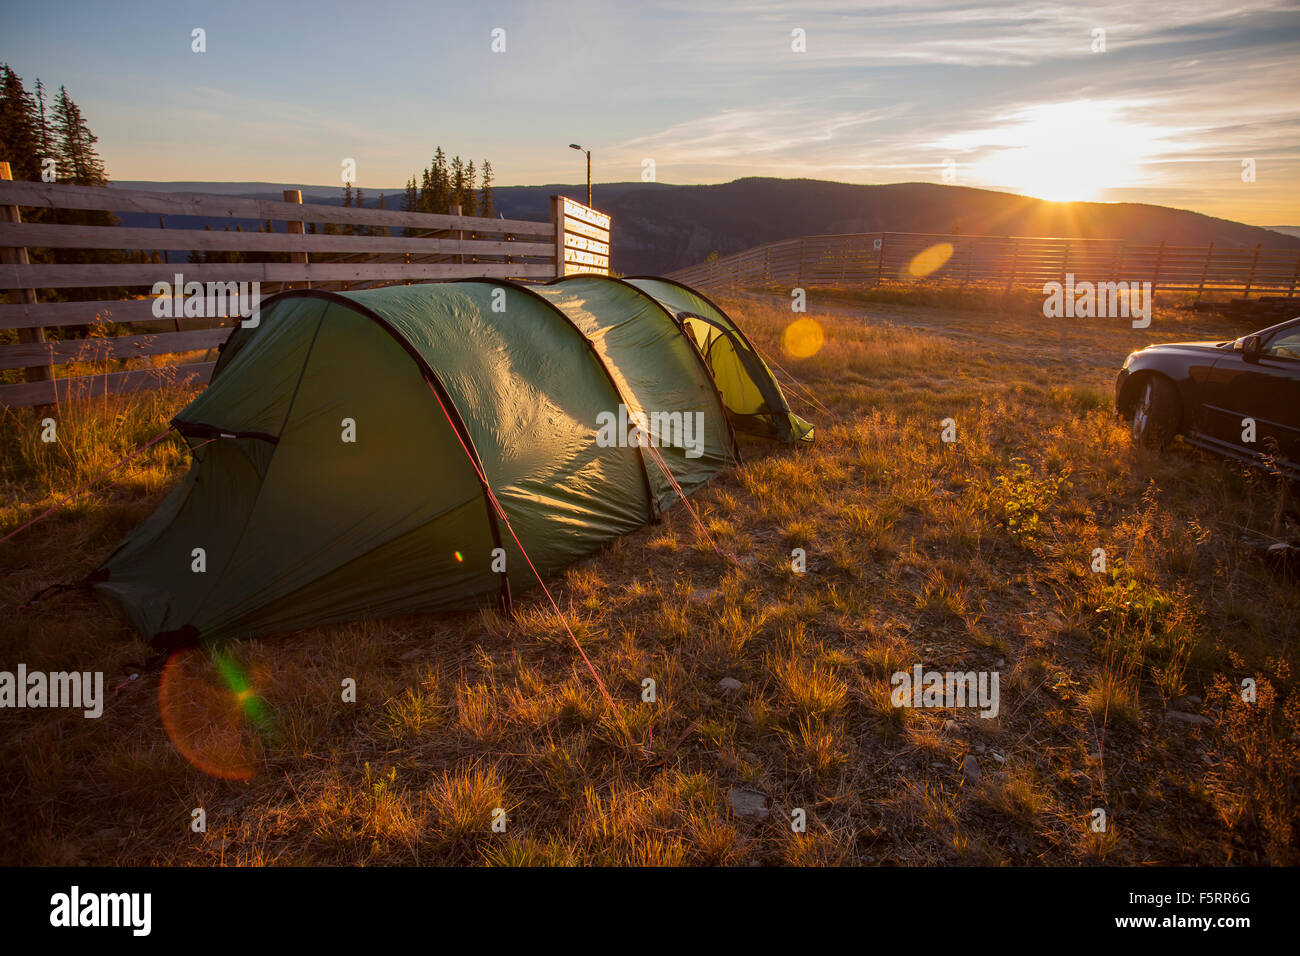 Norvegia, Hafjell, tenda al tramonto Foto Stock